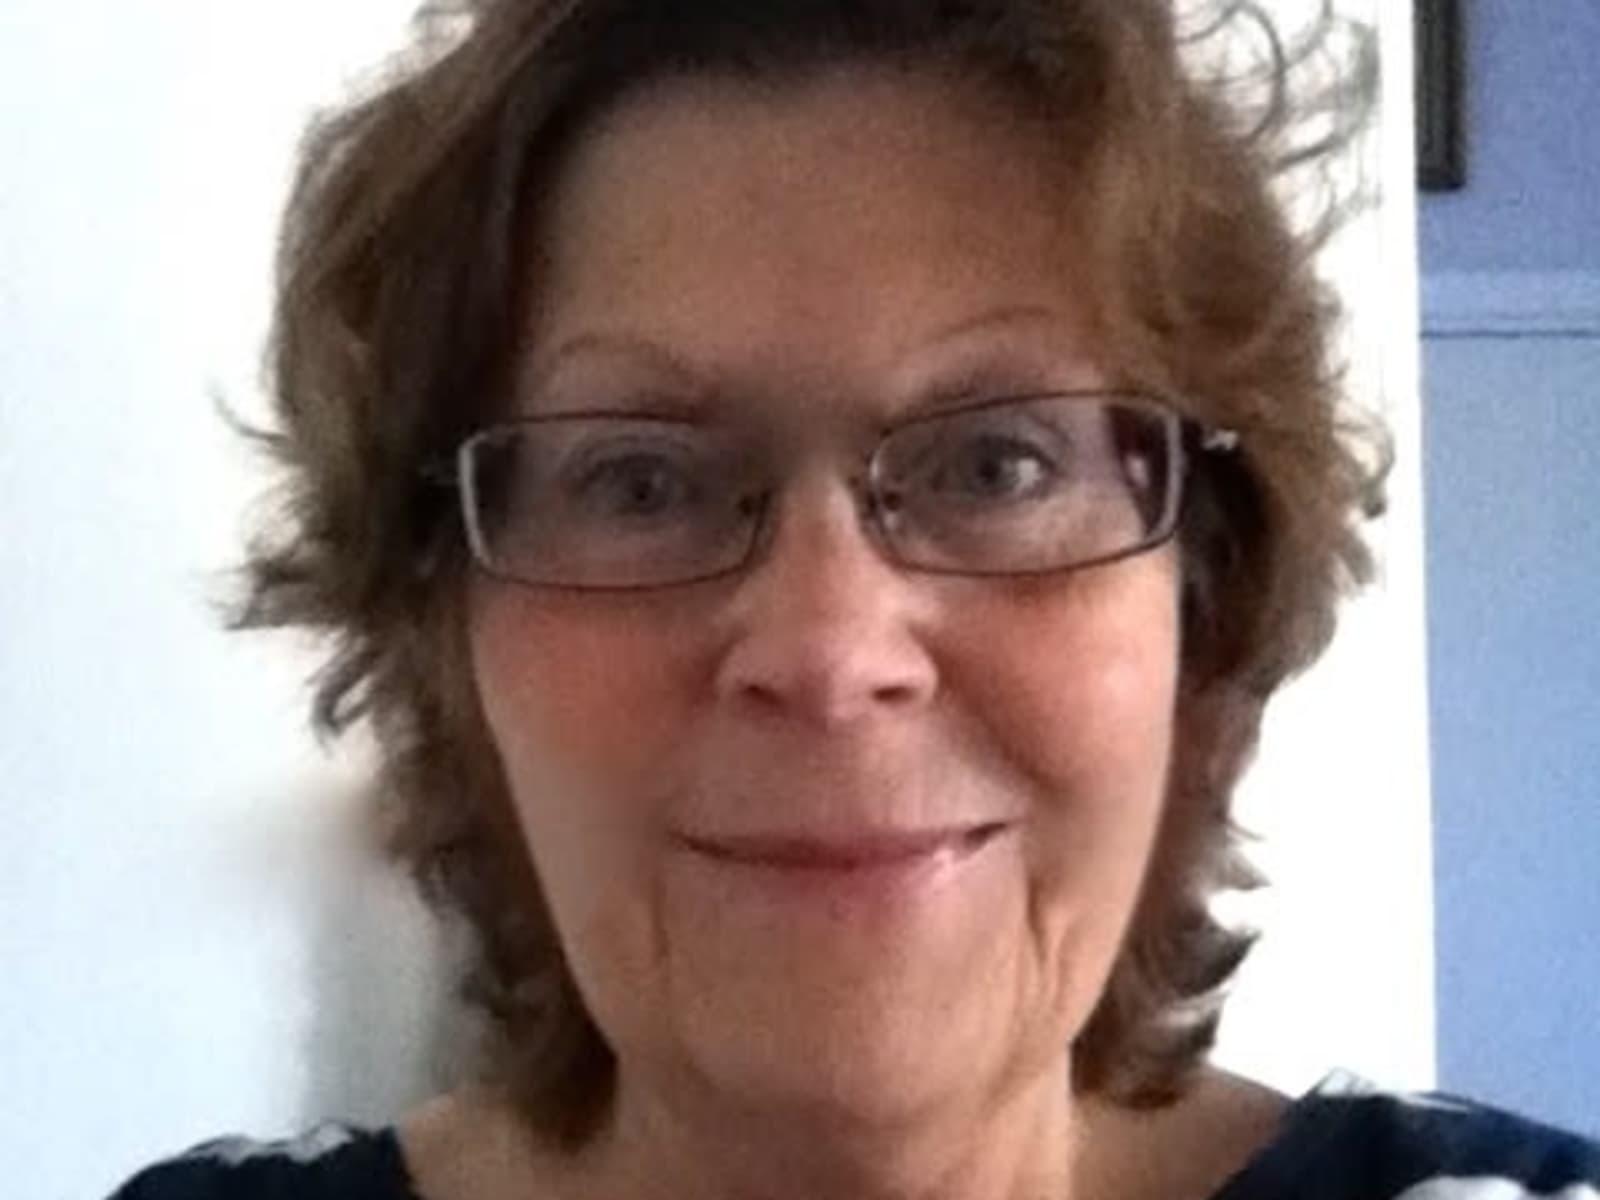 Maria from Stockholm, Sweden